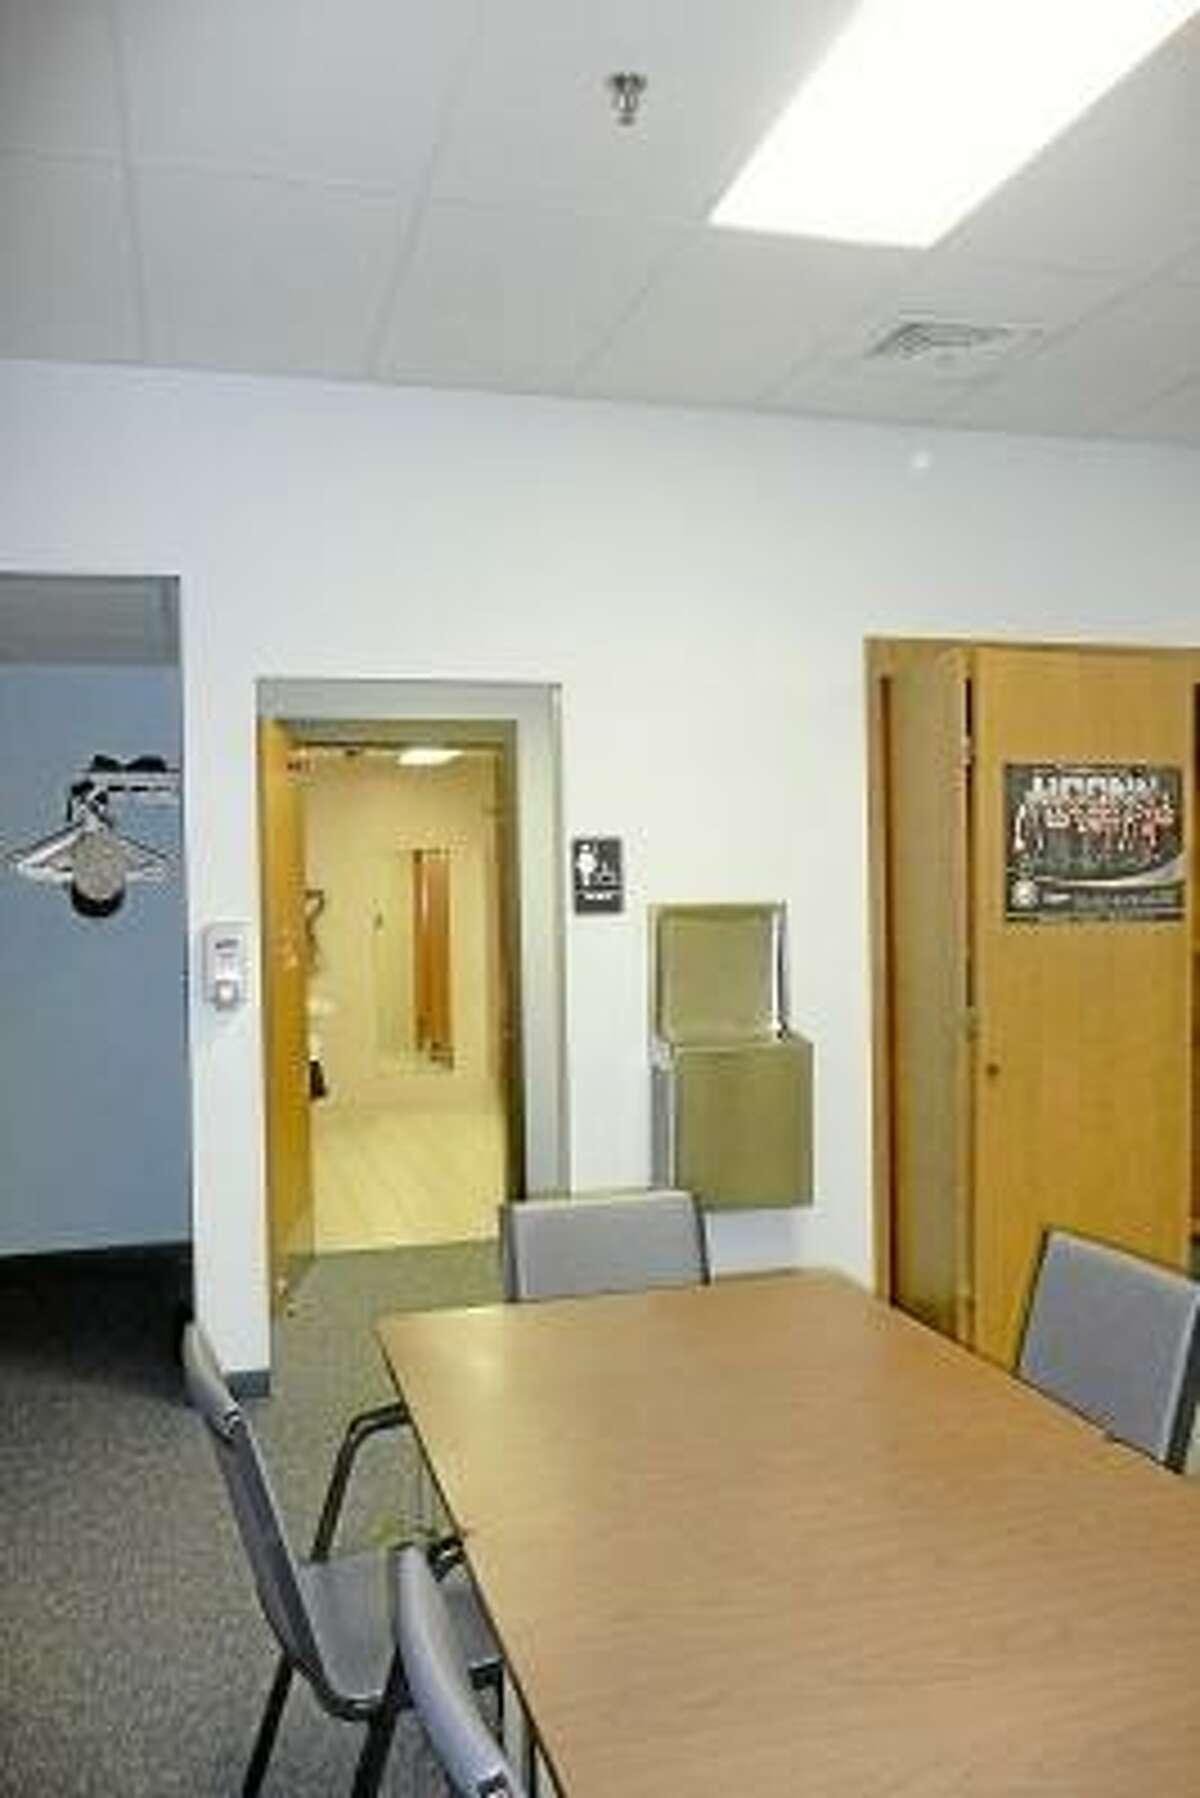 Bathrooms at the Sullivan Senior Center in Torrington are in need of renovations. Kate Hartman/Register Citizen